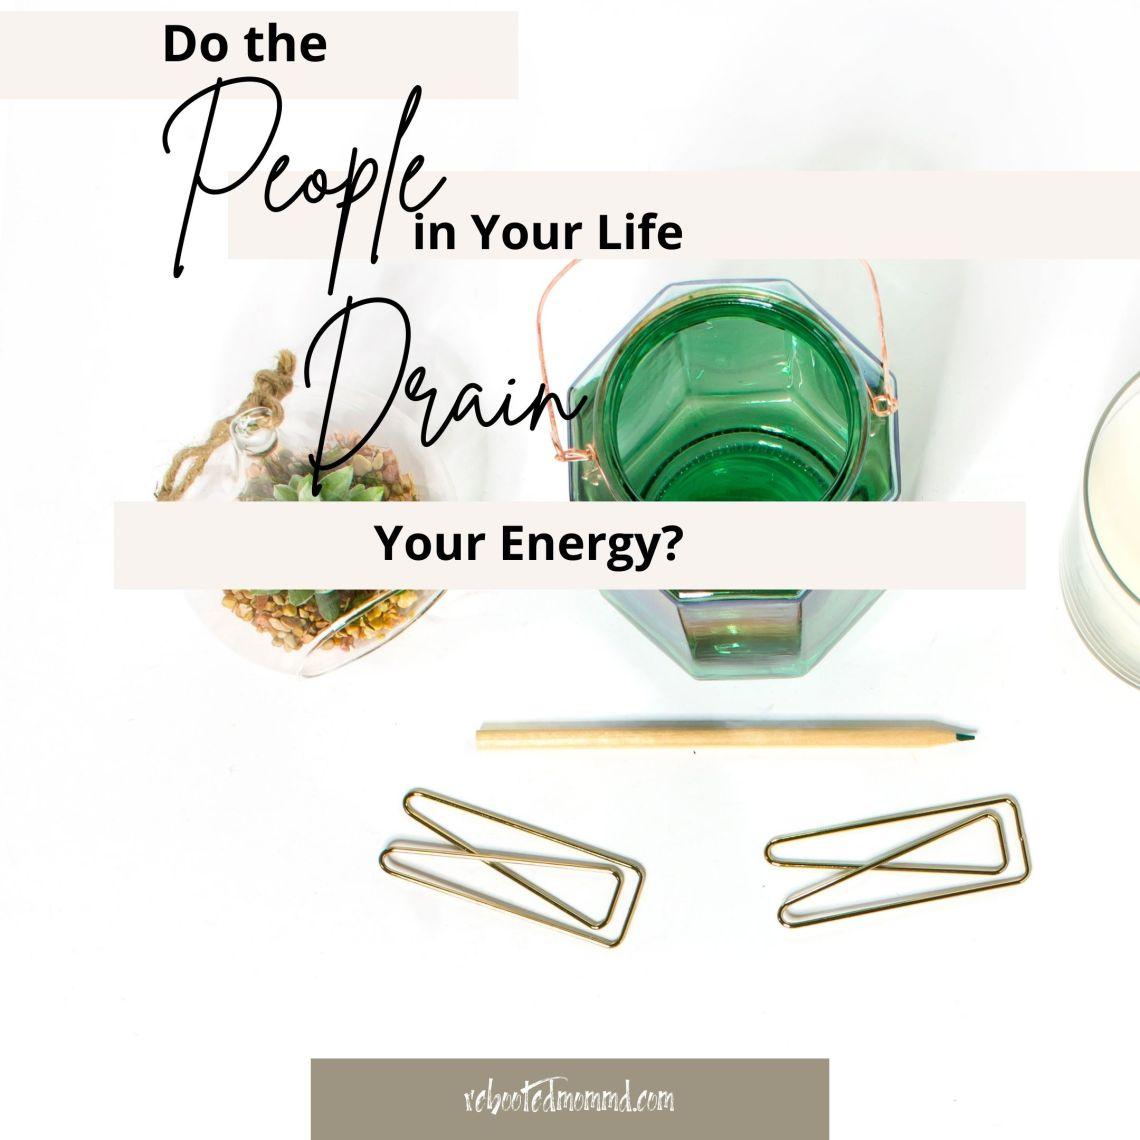 draining your energy